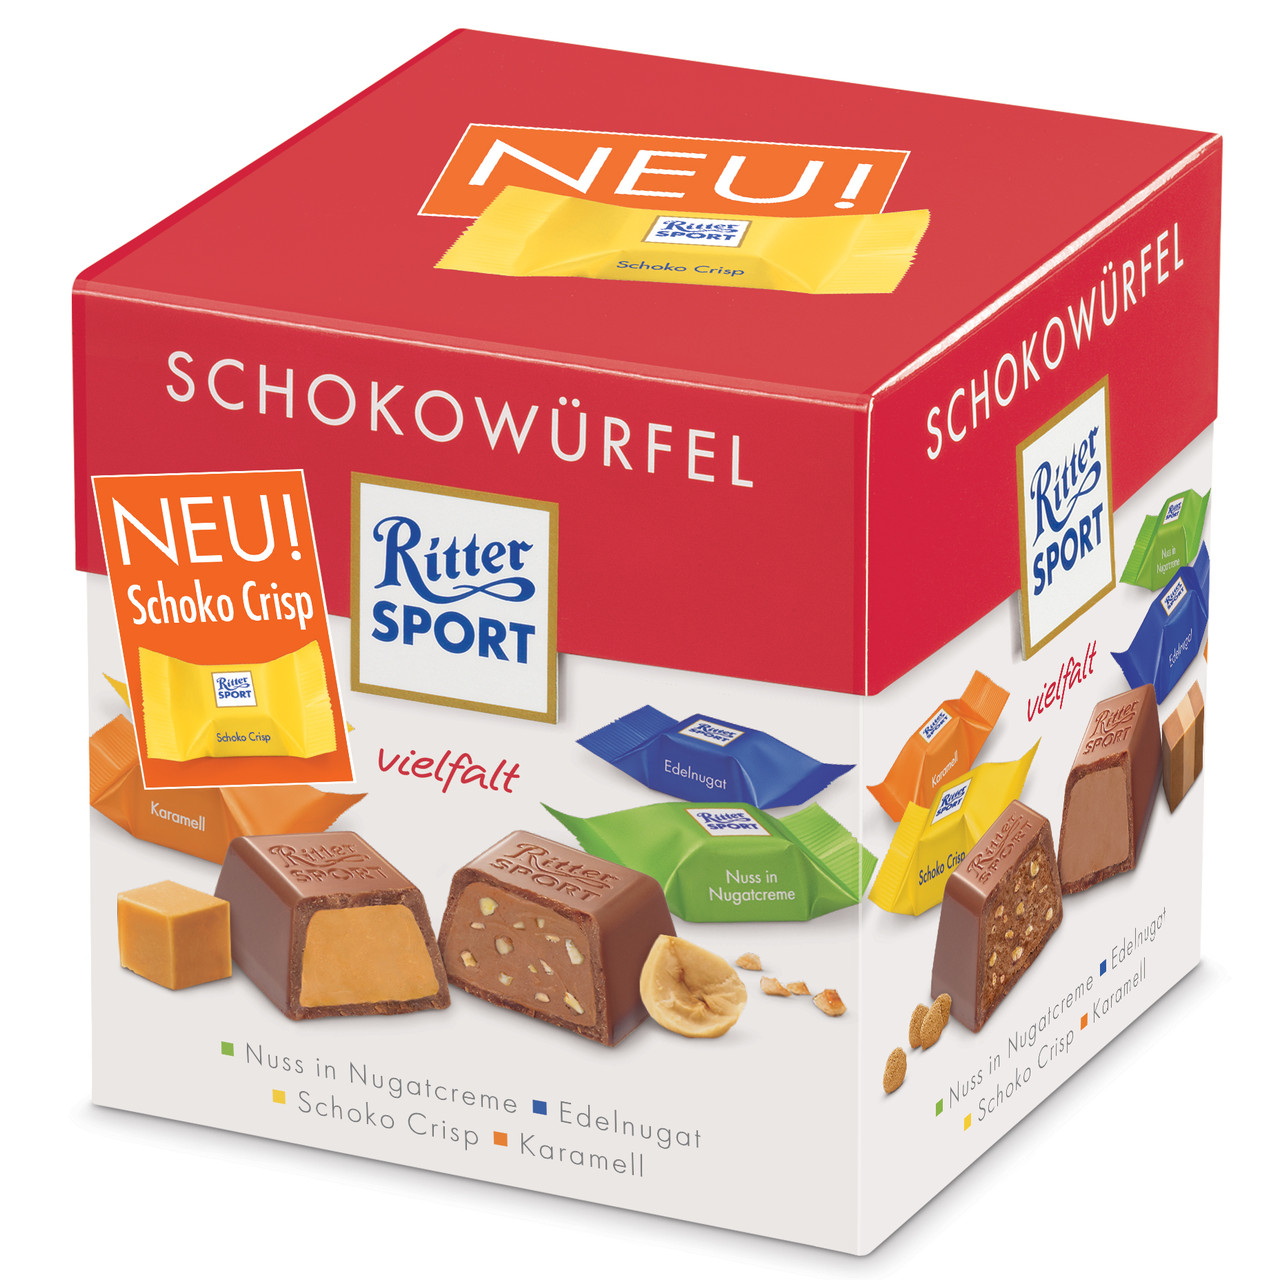 Набор шоколадных конфет Ritter Sport Schokowurfel Vielfalt (Риттер Спорт ассорти), 176 г.